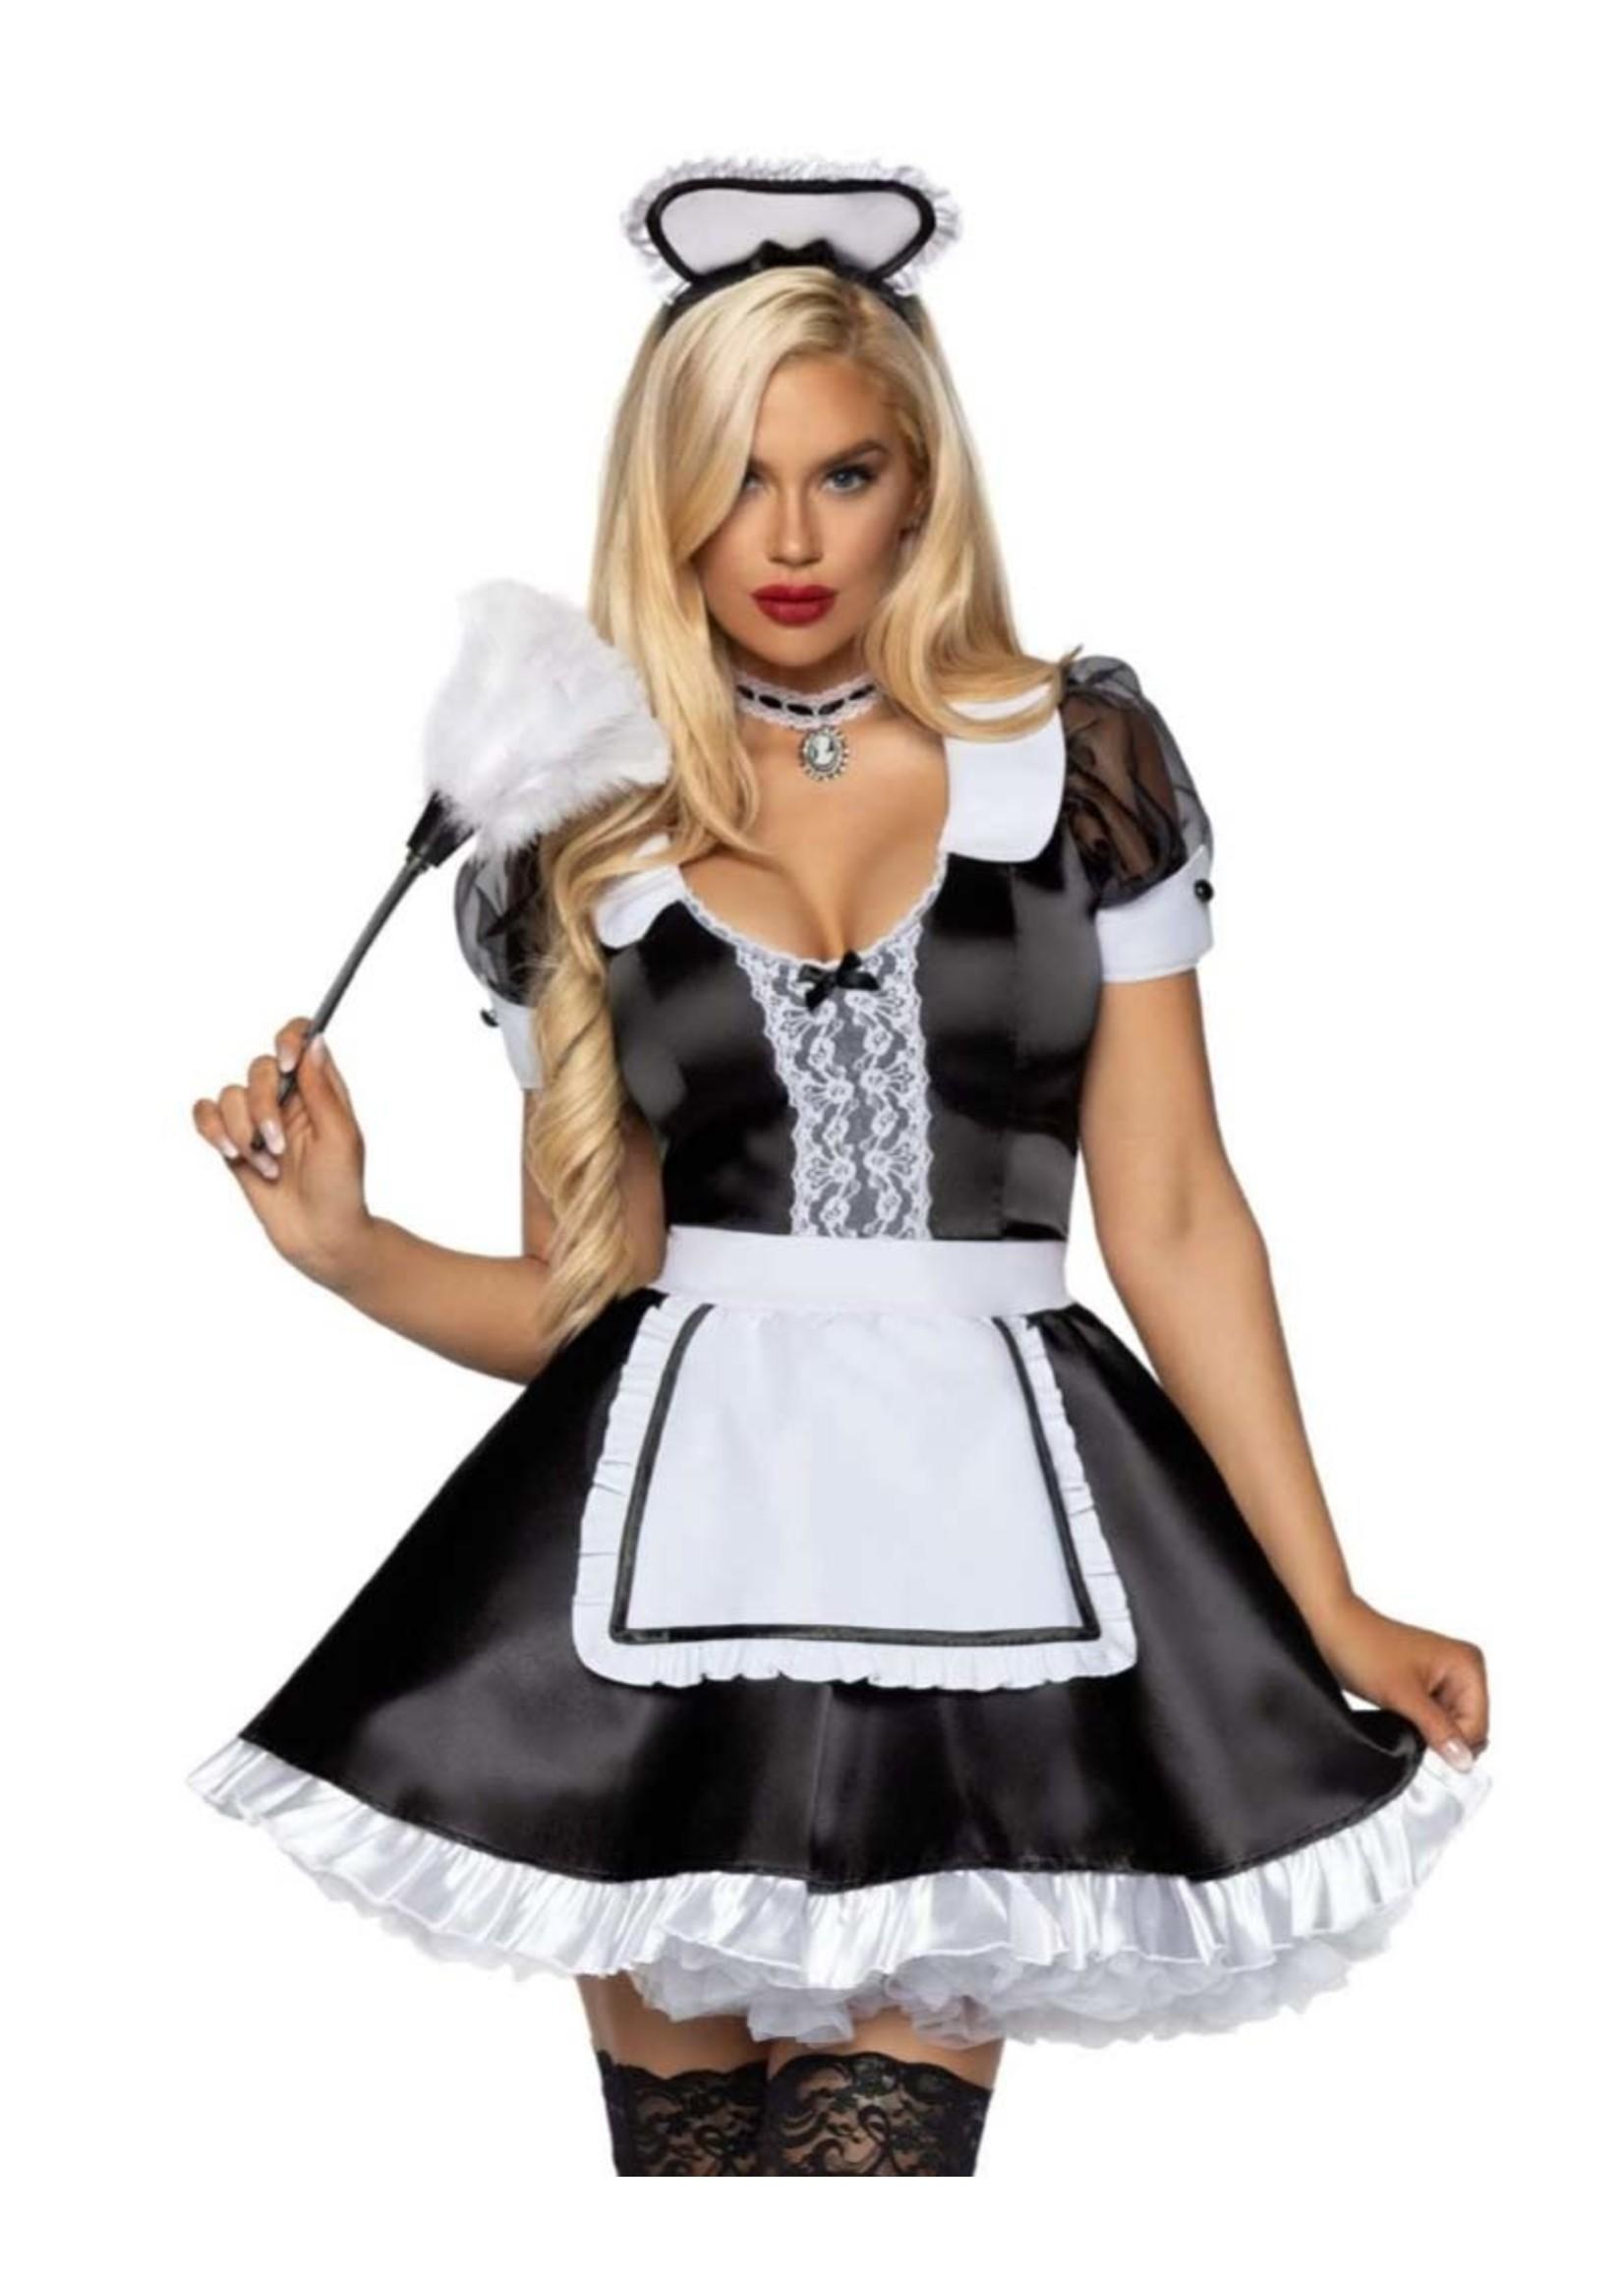 LEG AVENUE French Maid - Women's